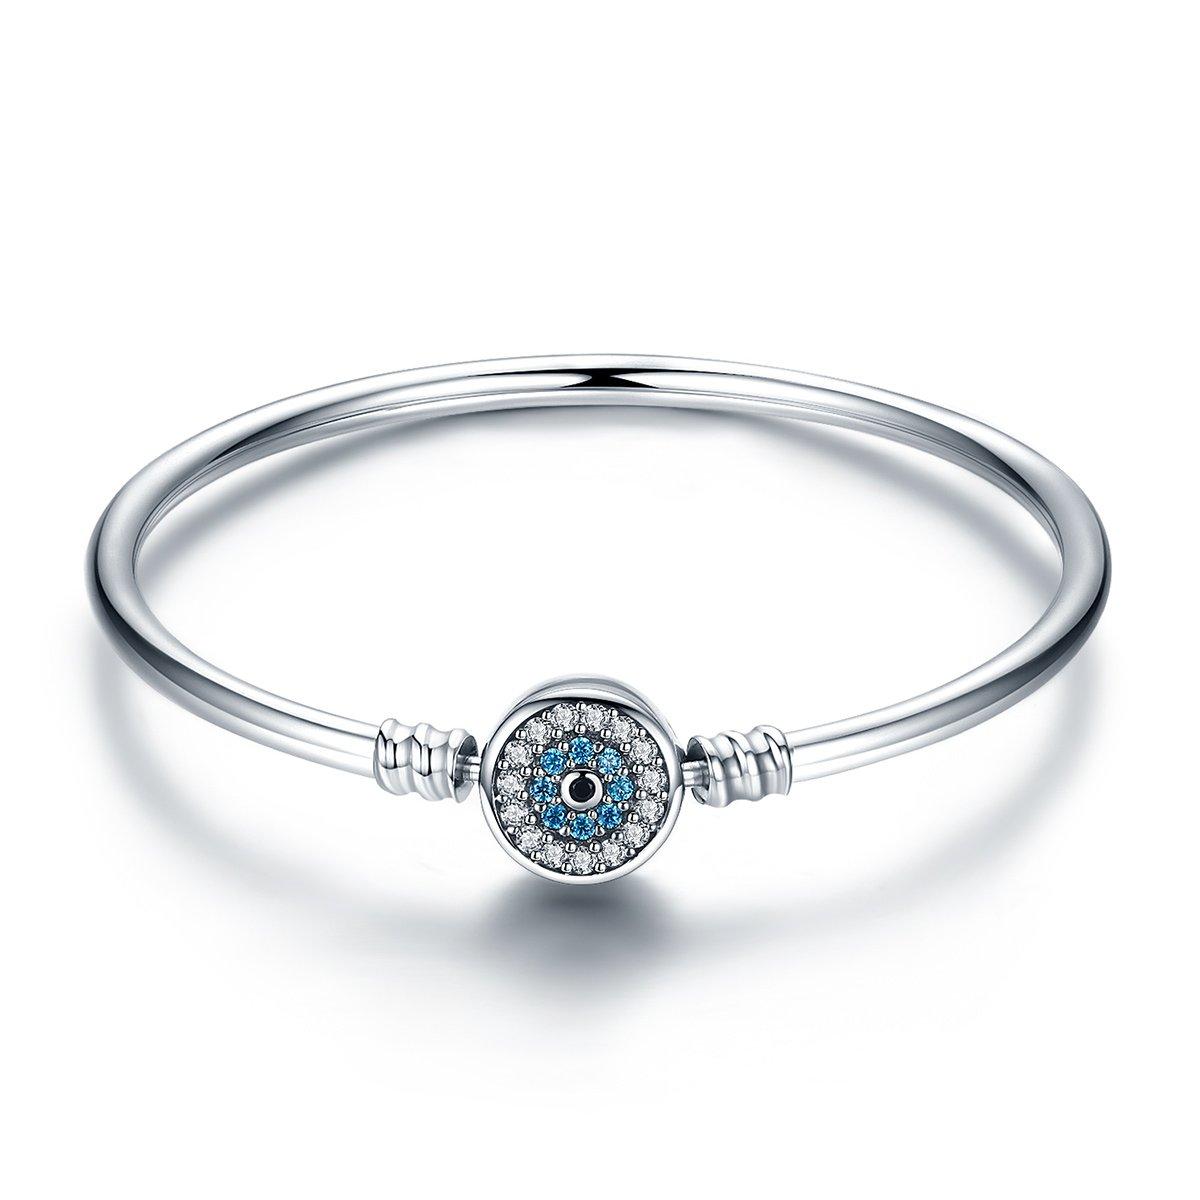 BISAER Evil Eye Bracelet Clasp Charm Bangle Bracelet For Bead Charms with Sapphire Gemstones Evil Eye Clip Lock Stopper(19cm/7.5inch)